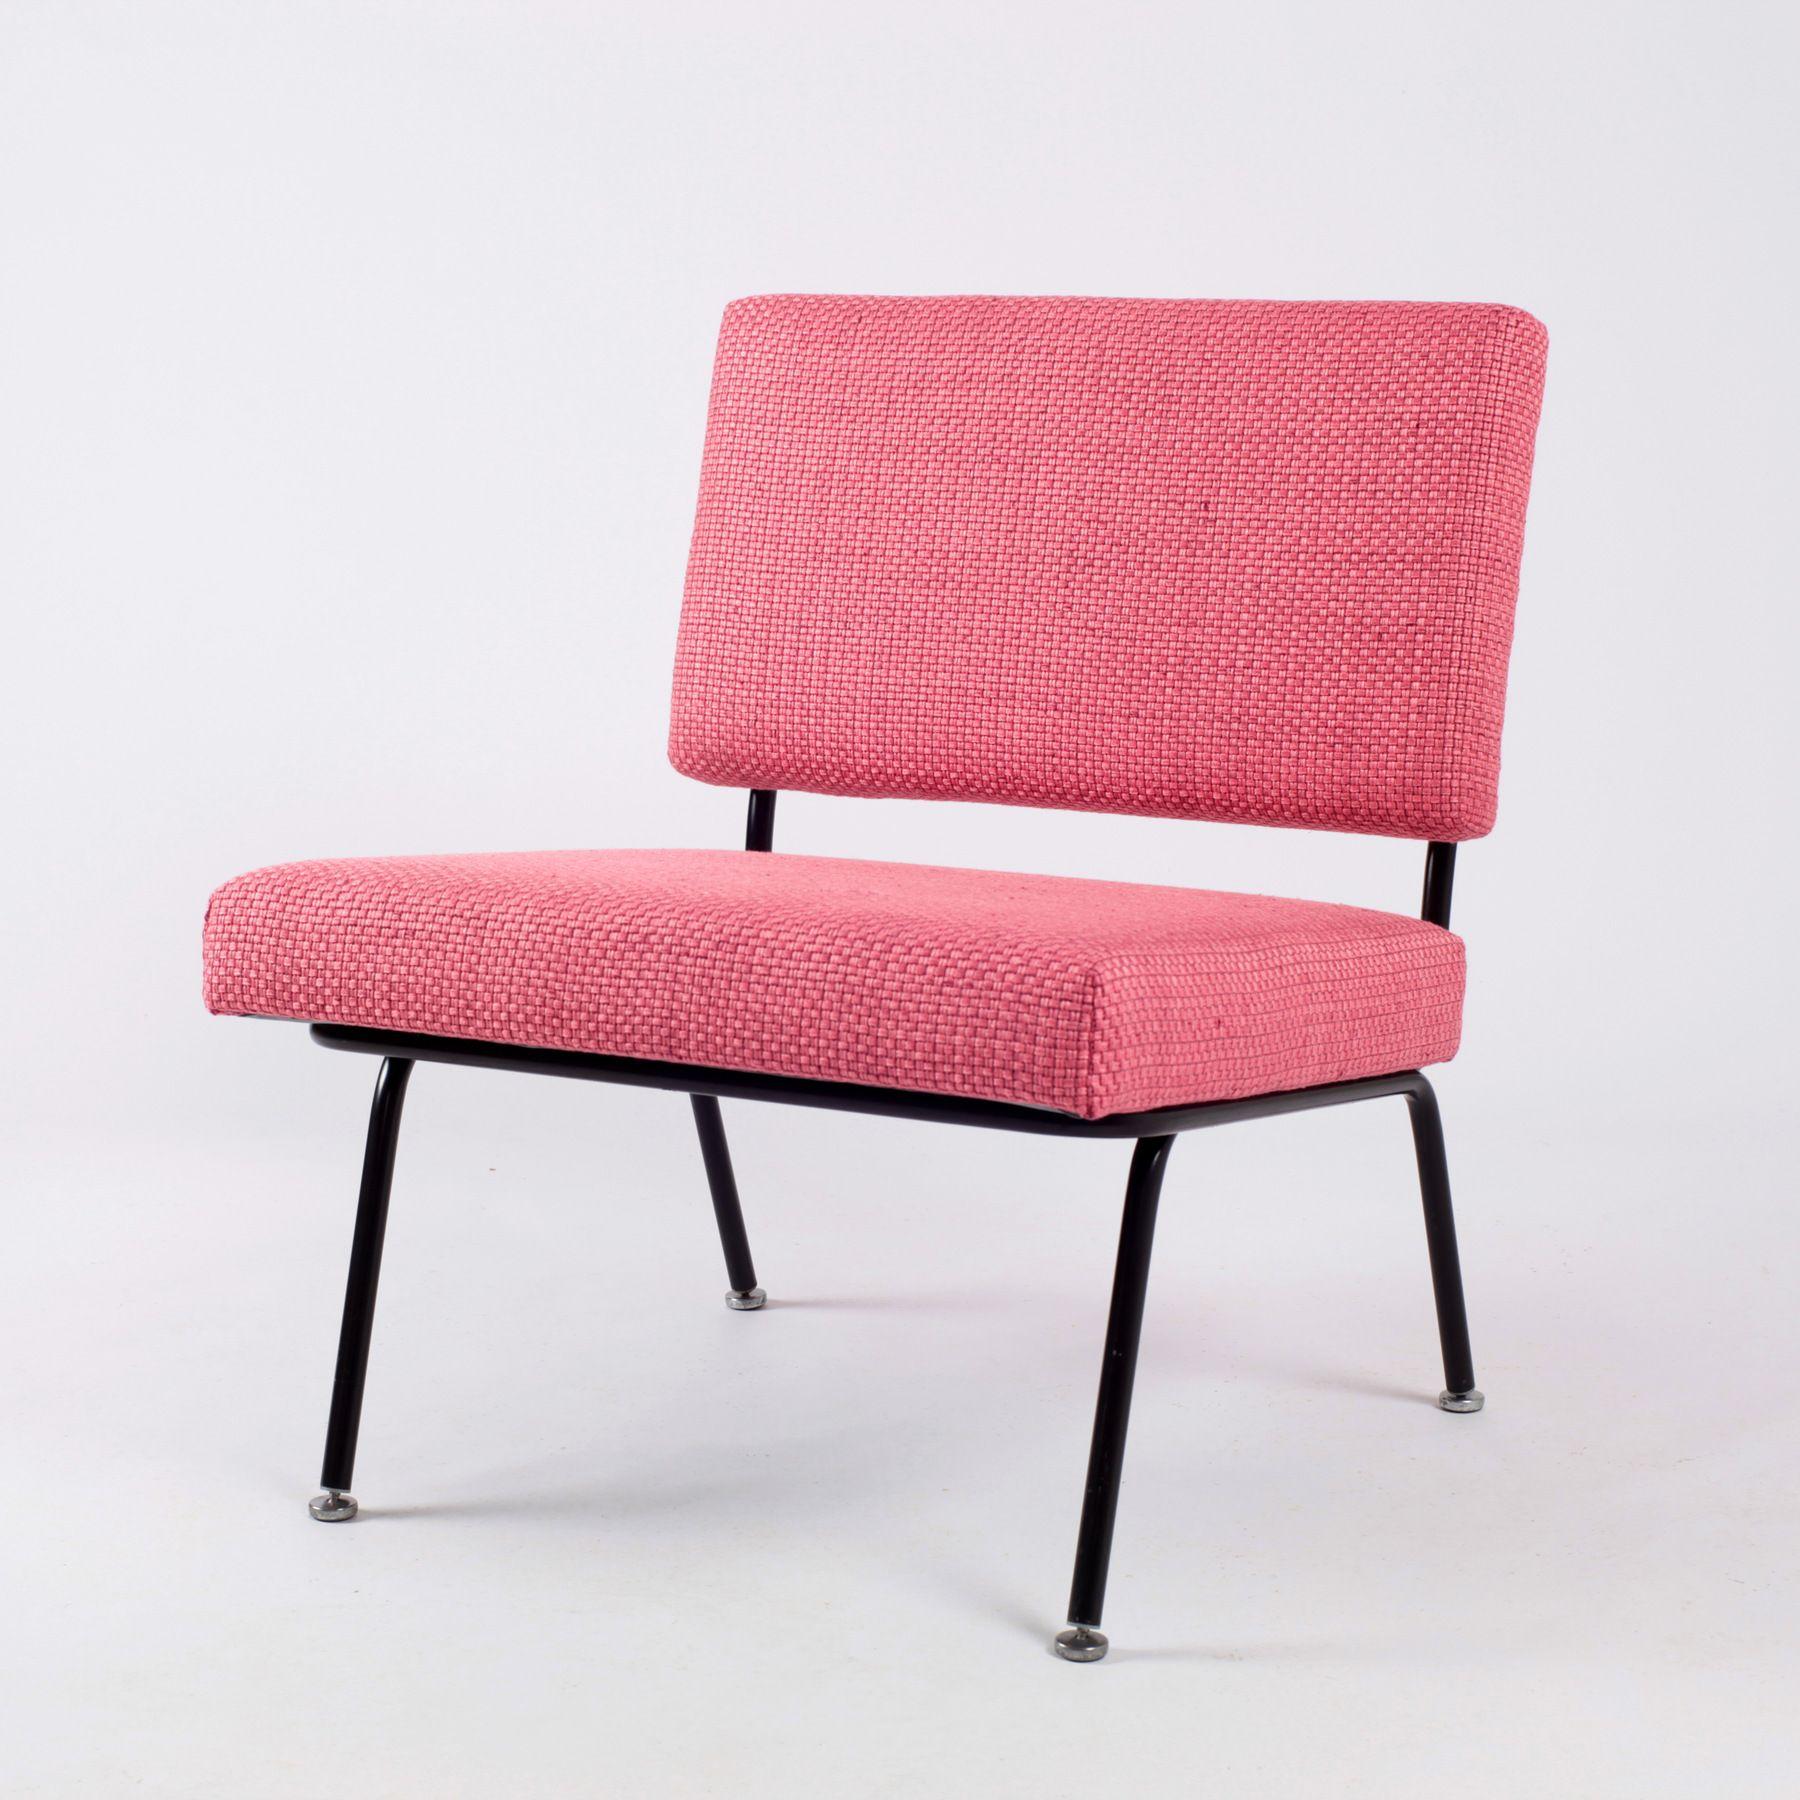 Florence Knoll 31 Knoll Usa 1954 Mobilier De Salon Chaise Meuble Interieur